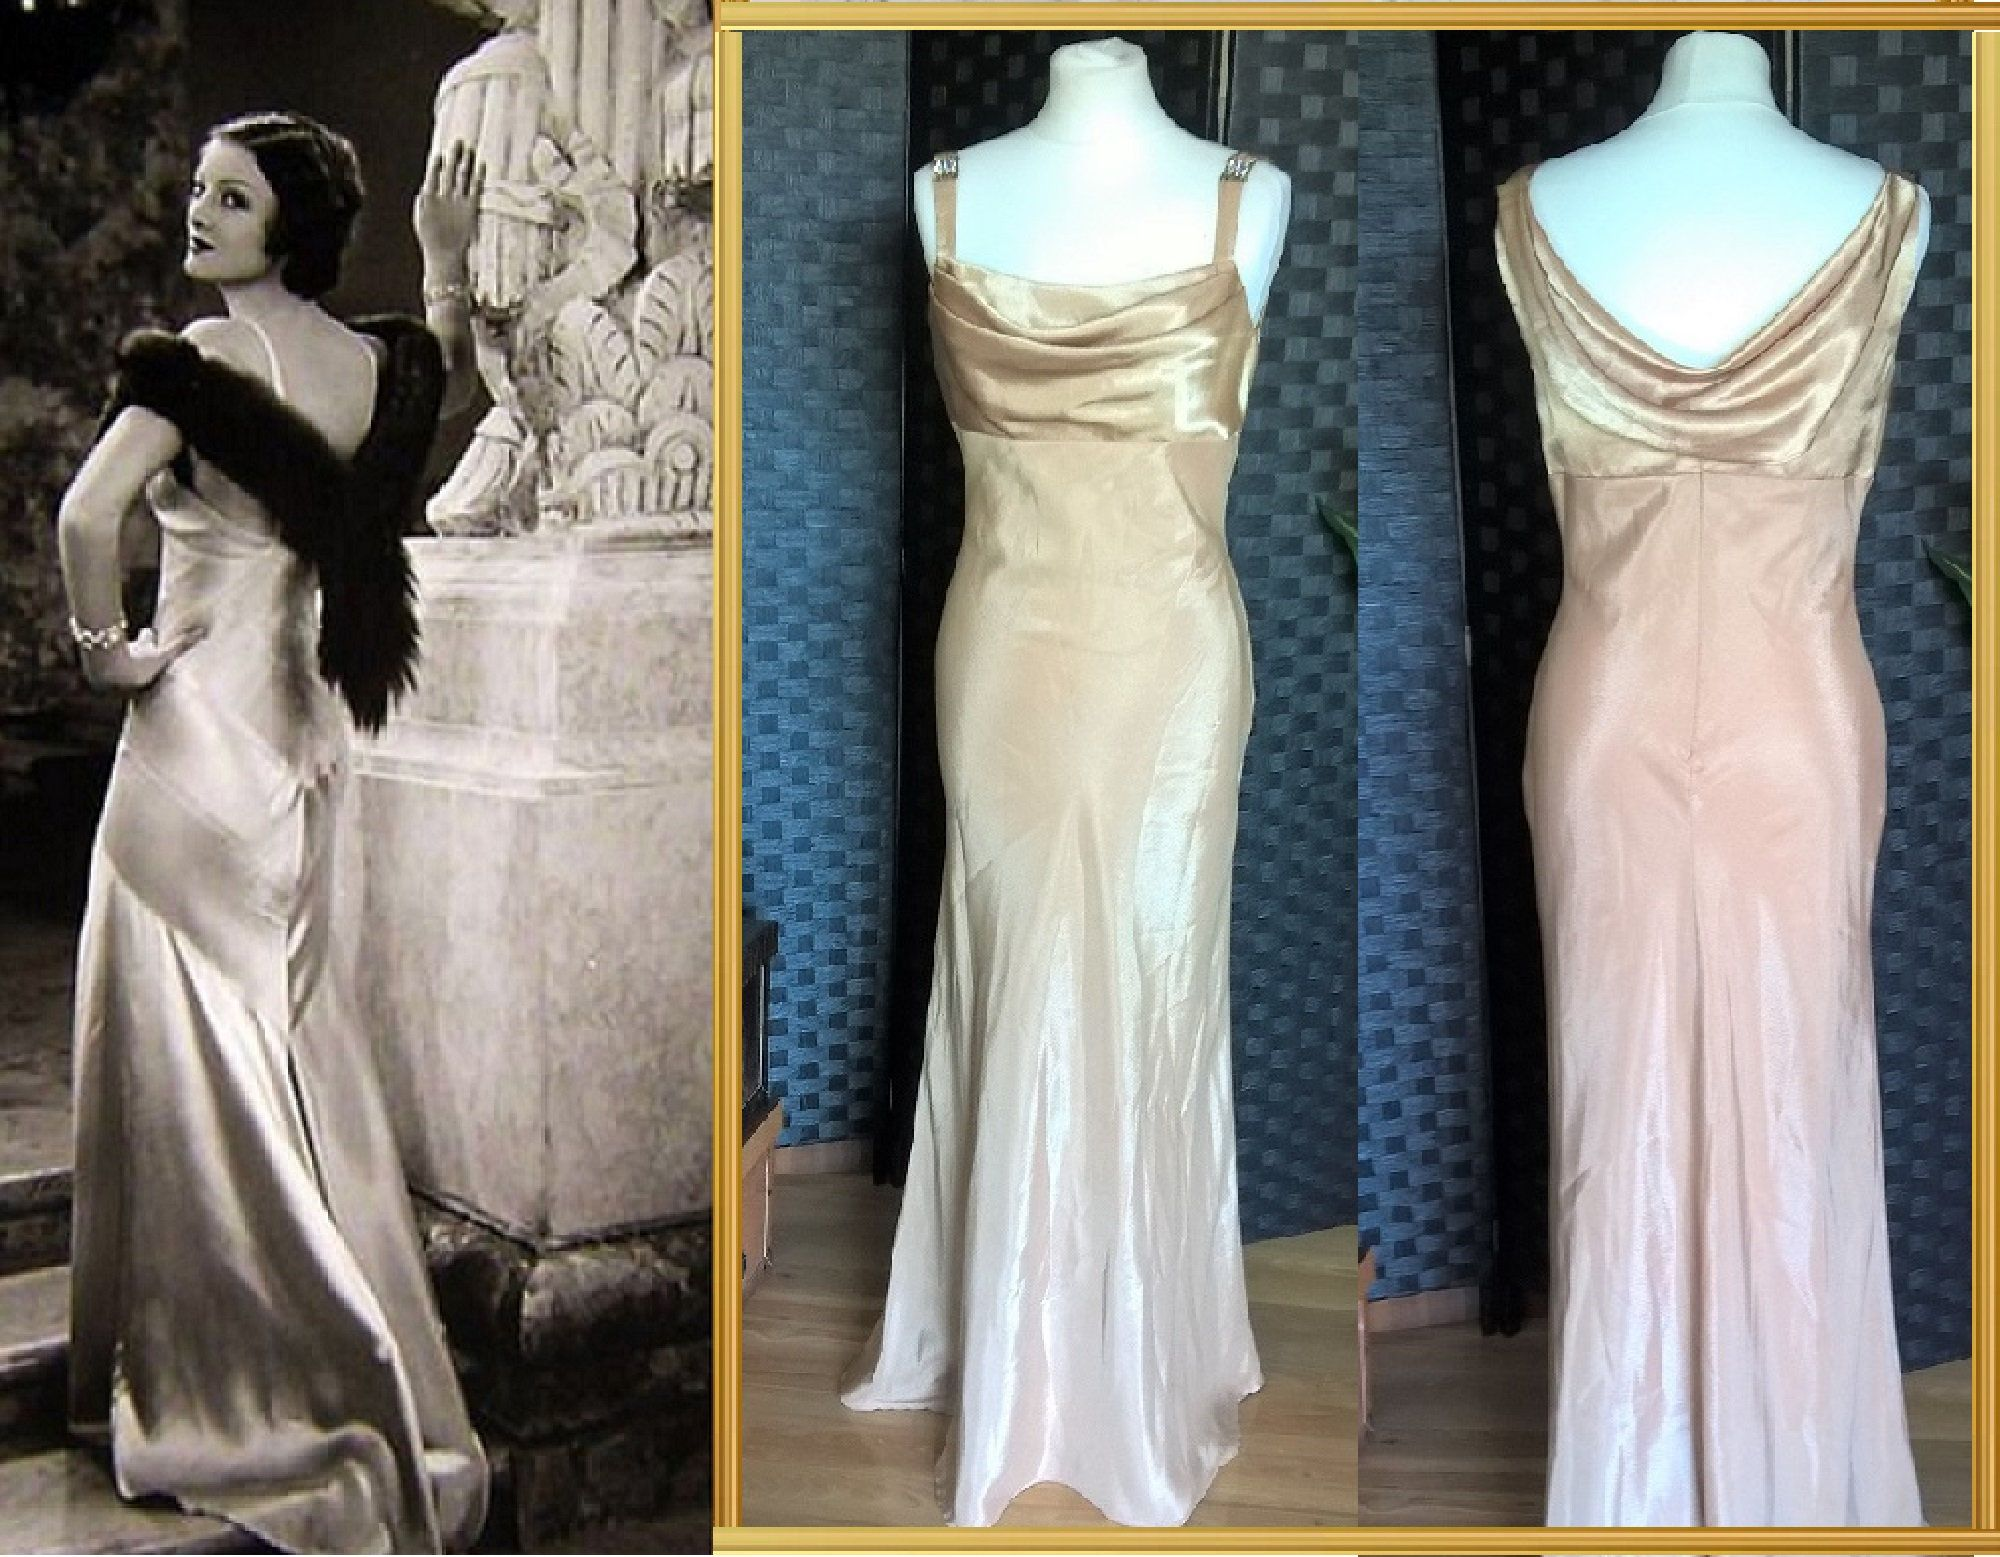 Pink Dress  Satin Dress  Cowl Neck Dress  Bias Cut Dress  Cowl Back Dress  Prom Dress  Ball Gown  1930s Style Dress  Old Hollywood Dress